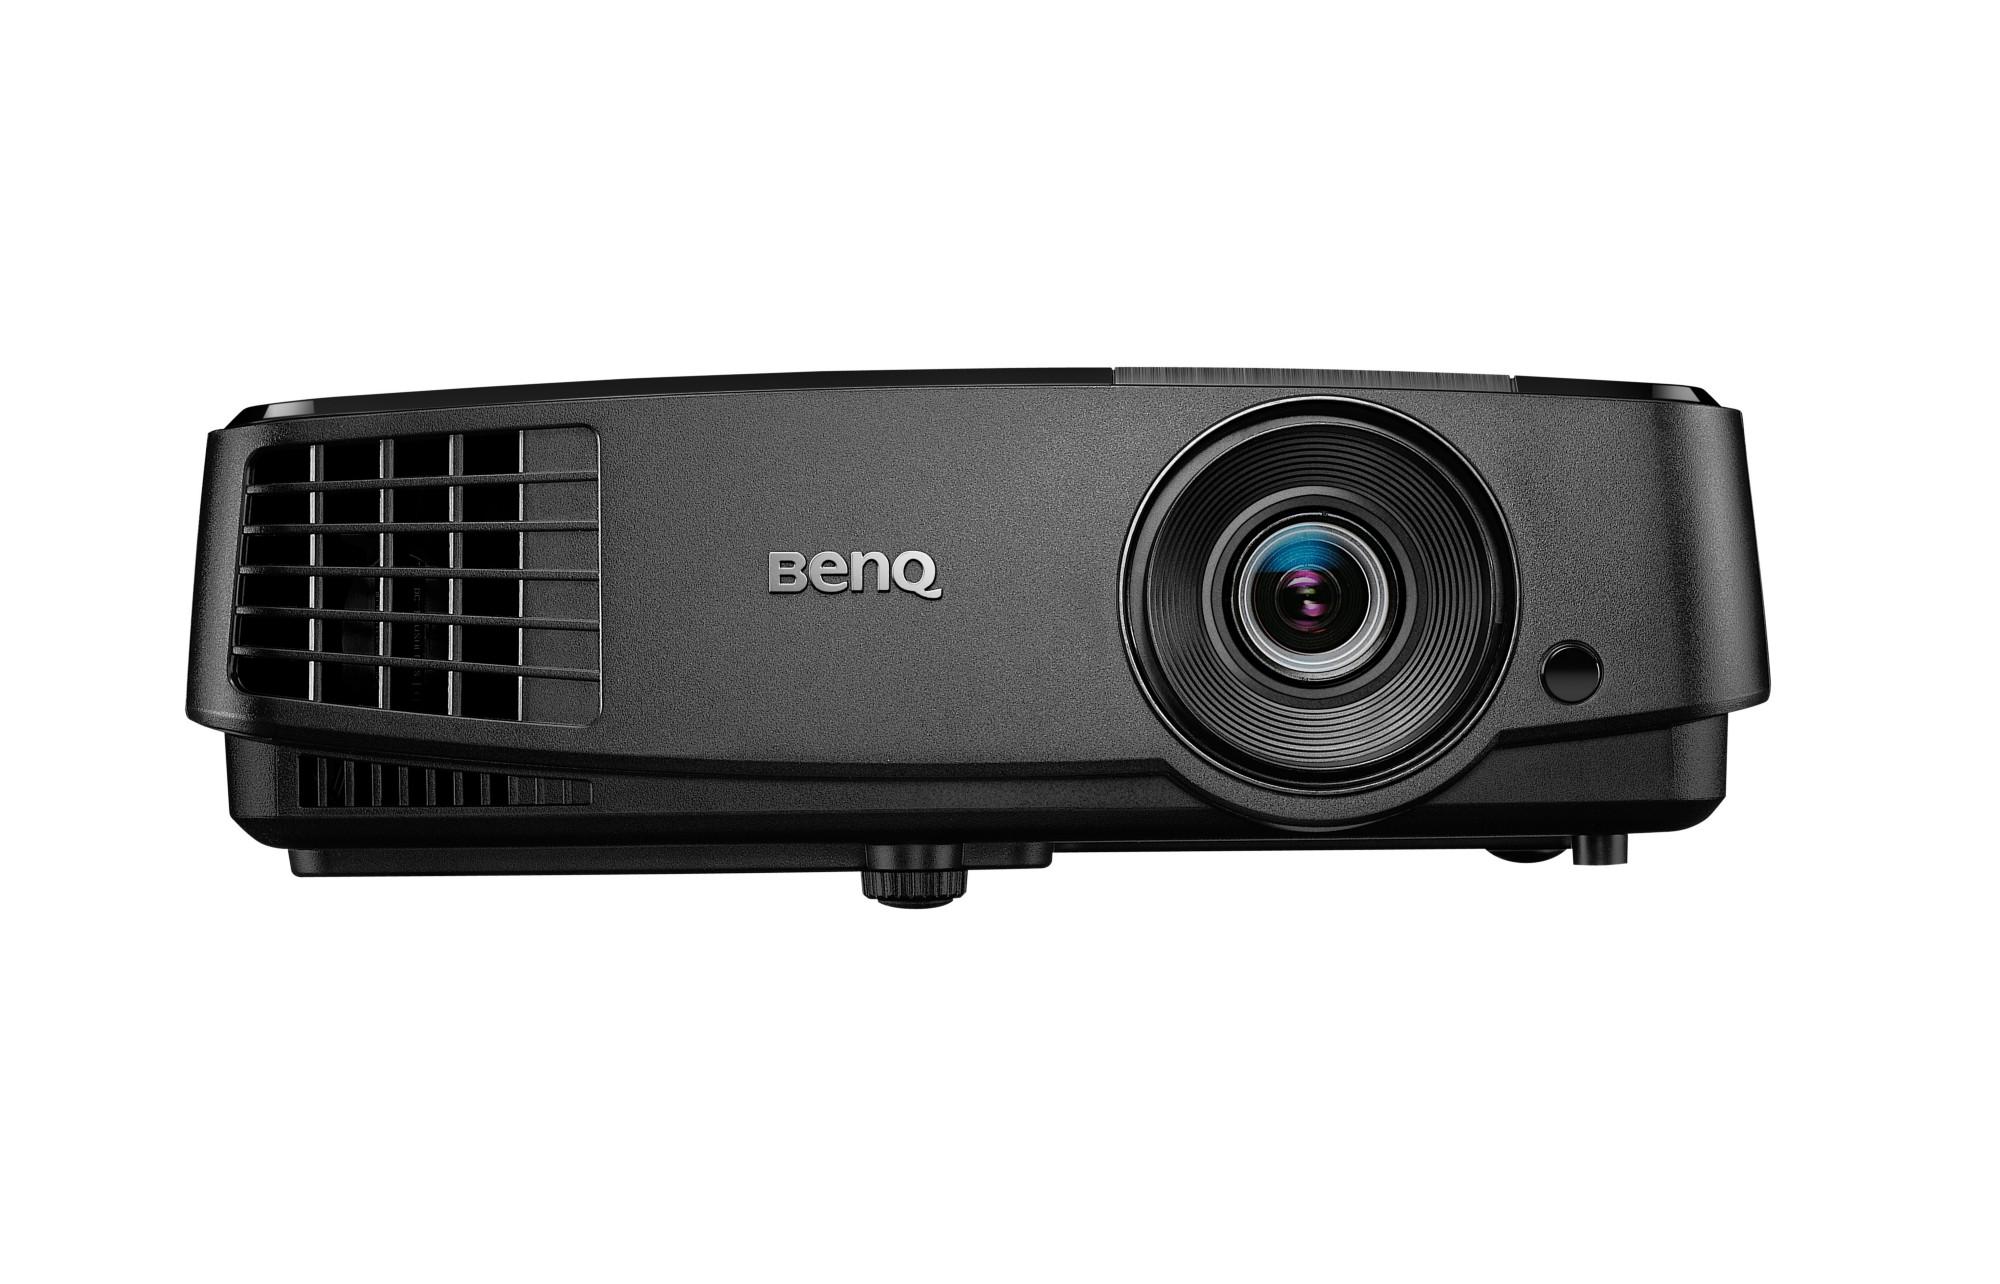 Benq MS506 Desktop projector 3200ANSI lumens DLP SVGA (800x600) 3D Black data projector